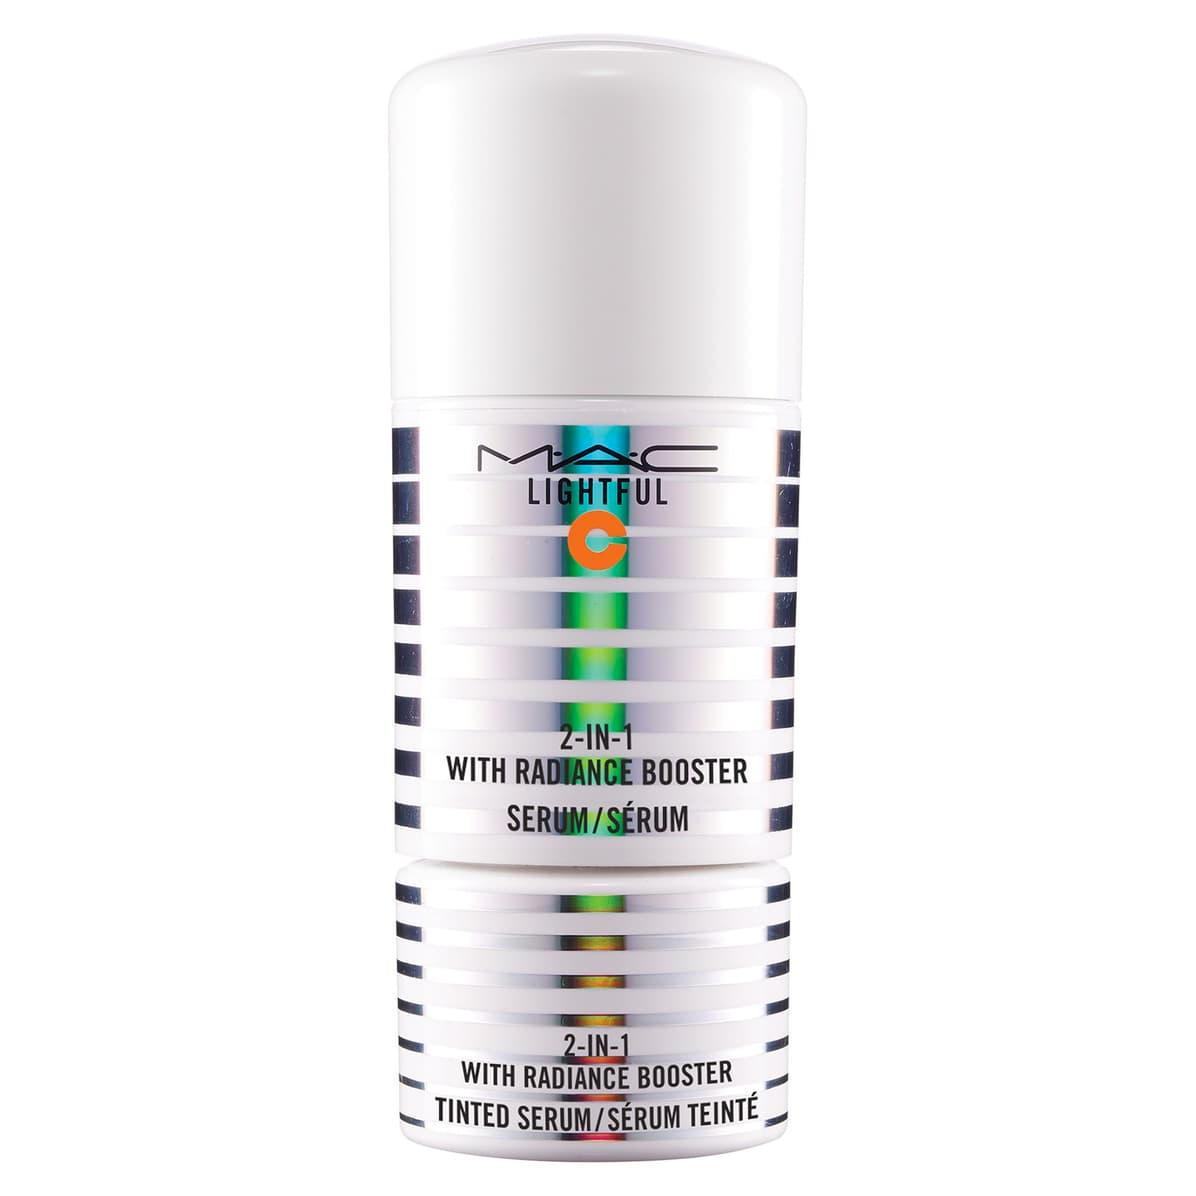 MAC Lightful 2-In-1 Tint & Serum With Radiance Booster Medium